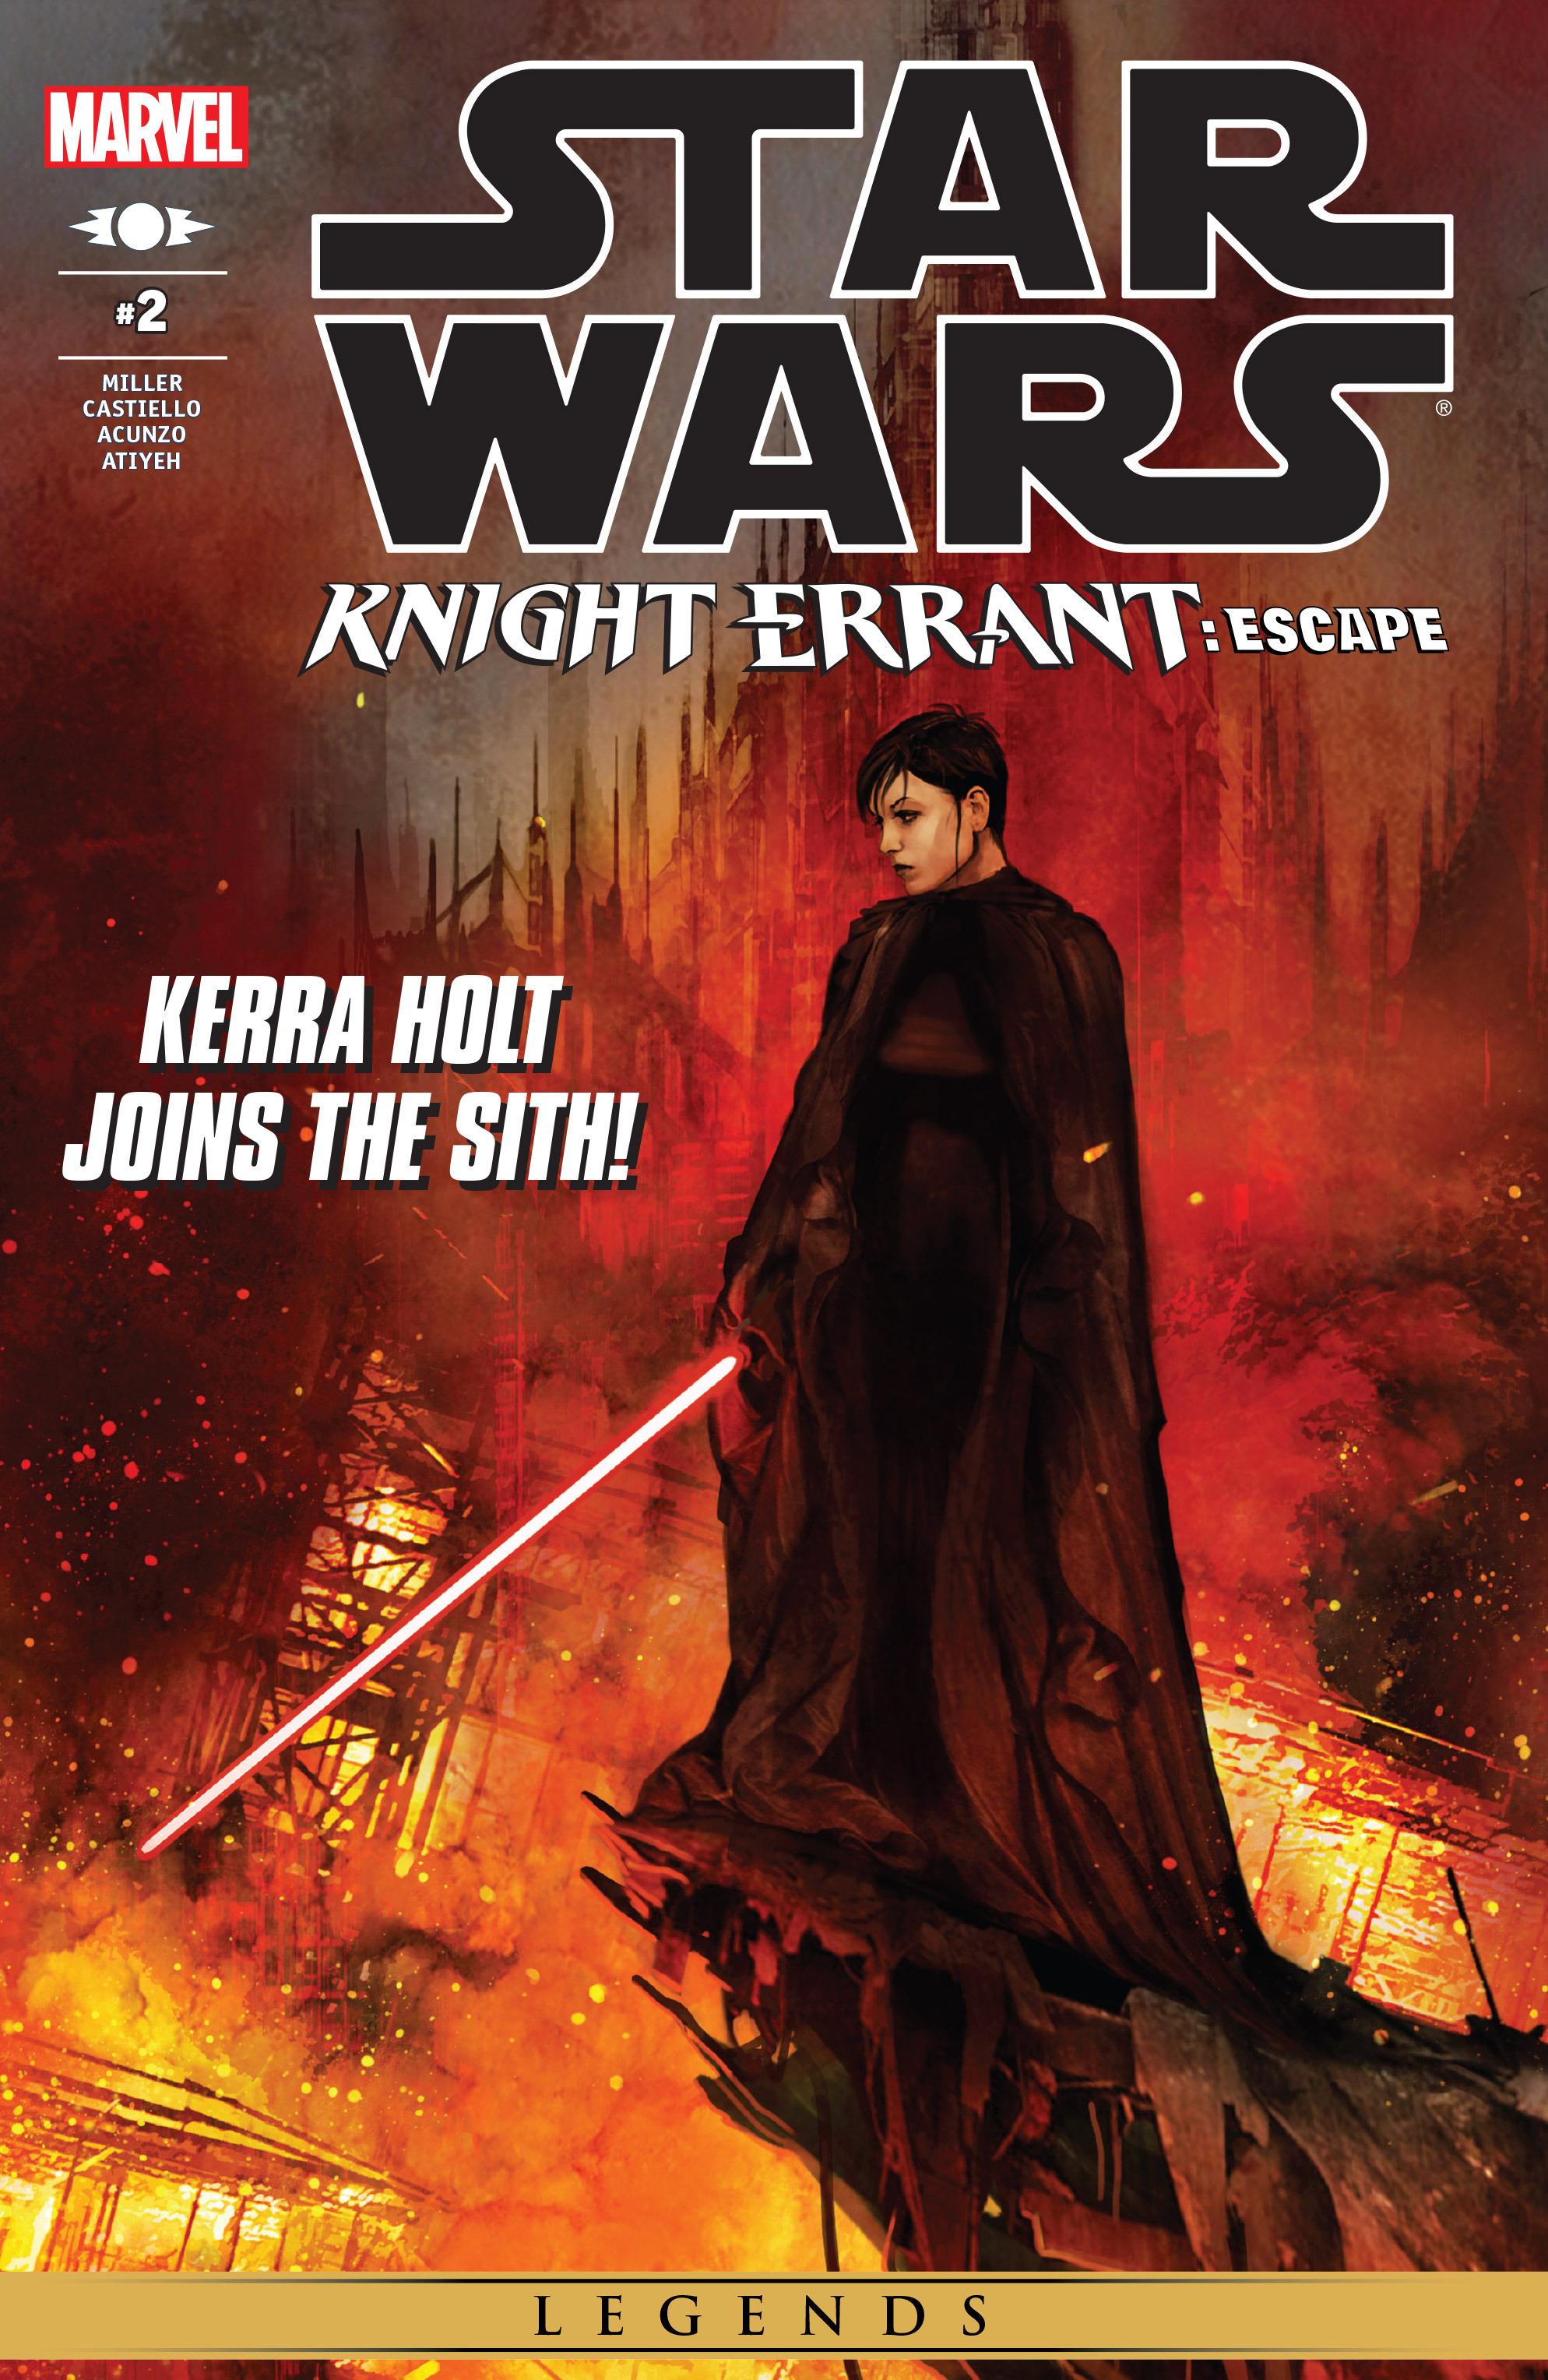 Read online Star Wars: Knight Errant - Escape comic -  Issue #2 - 1